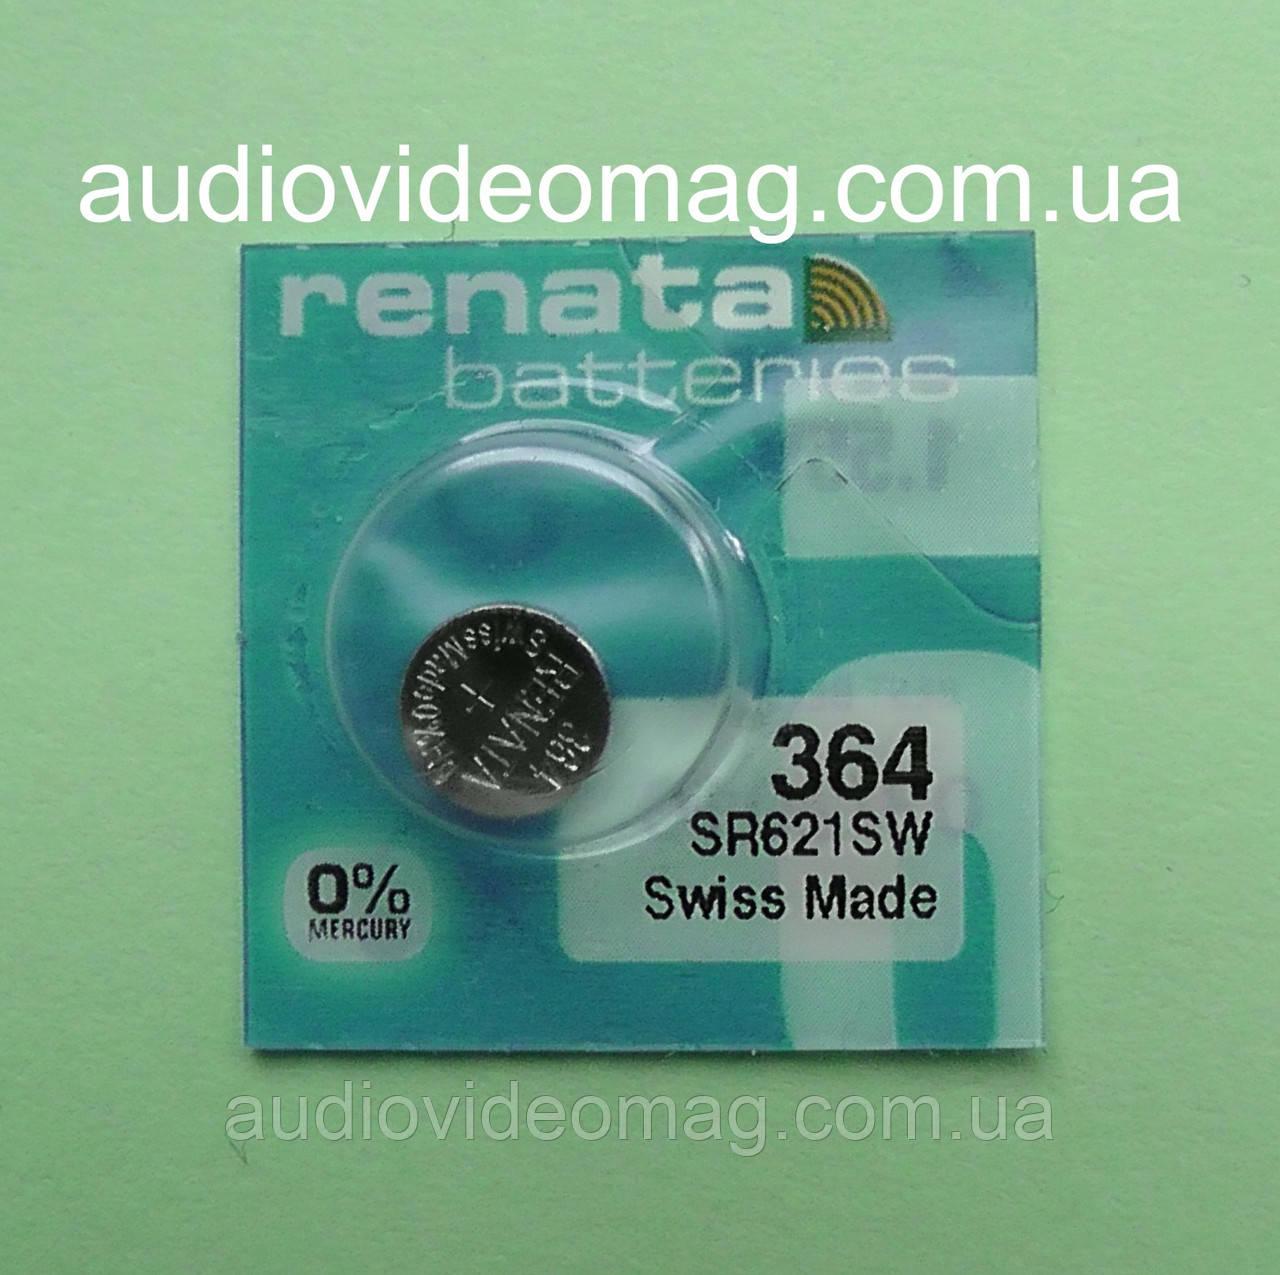 Батарейка Renata 364 (CR621SW) на оксиде серебра для часов